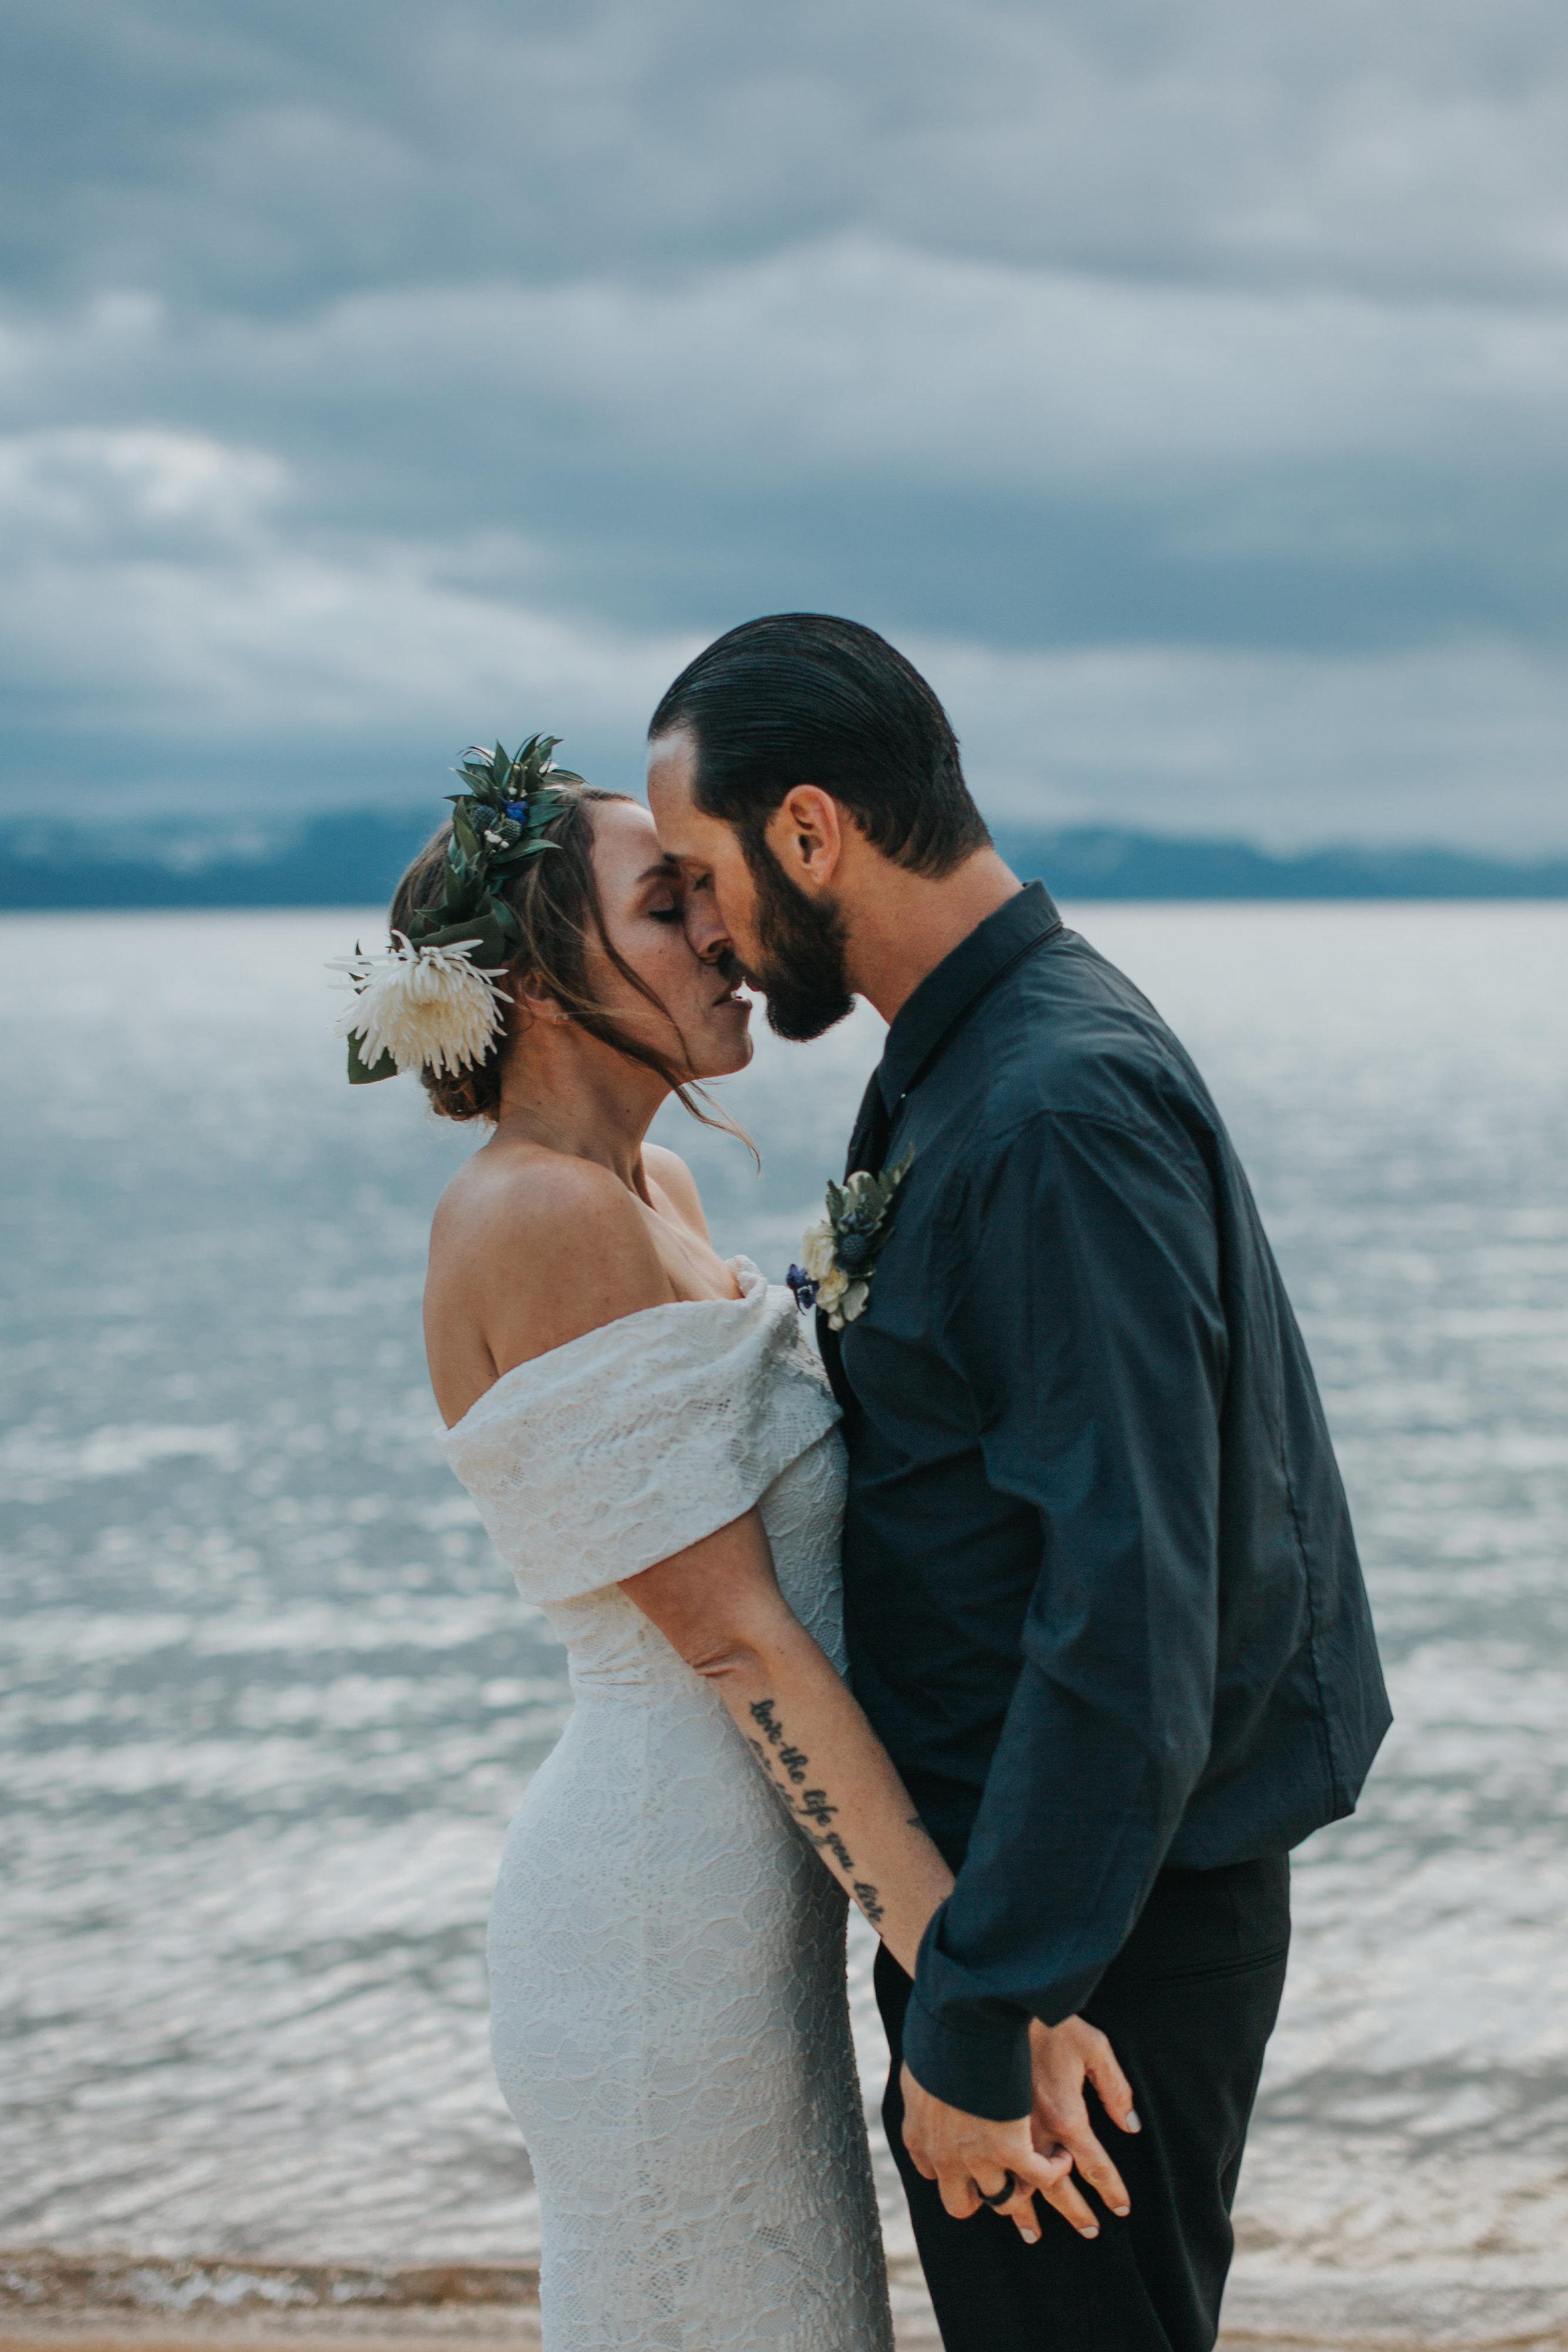 south-lake-tahoe-elopement-valerie-lendvay-photo-059.jpg